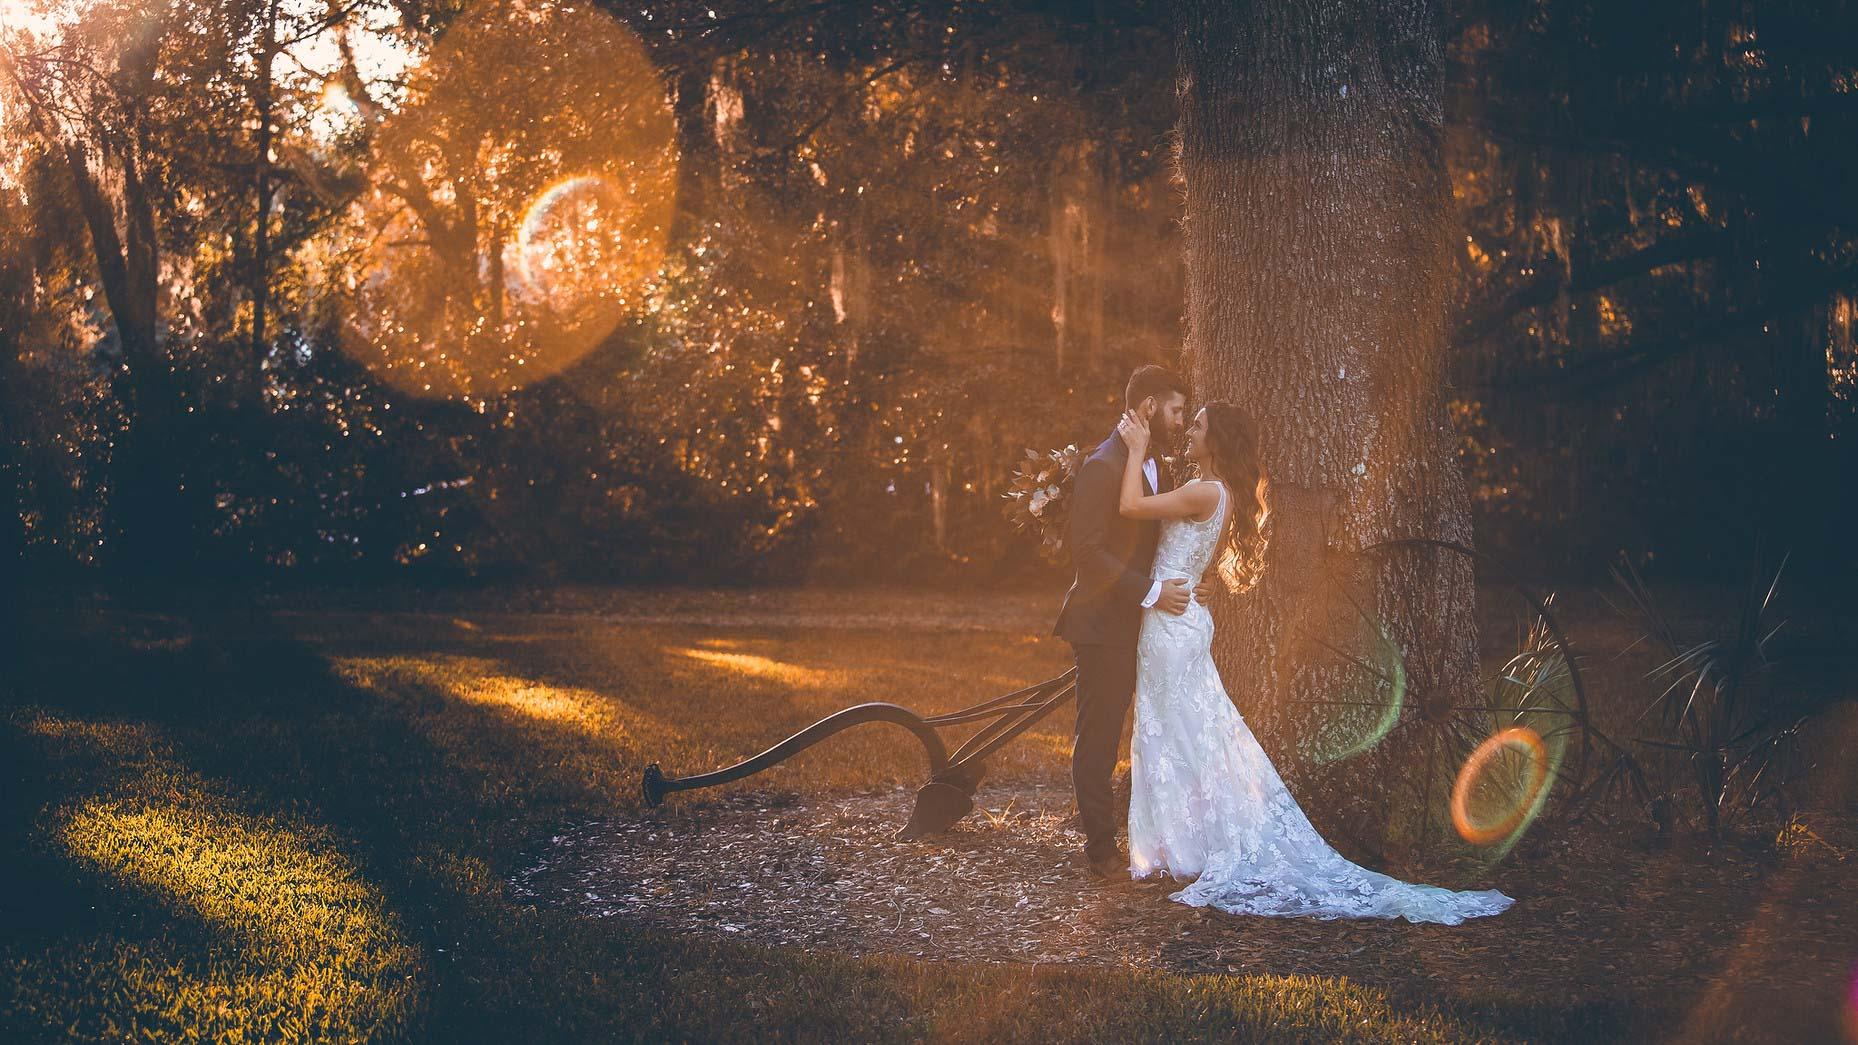 adam-szarmack-bowing-oaks-wedding-photographer-jacksonville-15.jpg